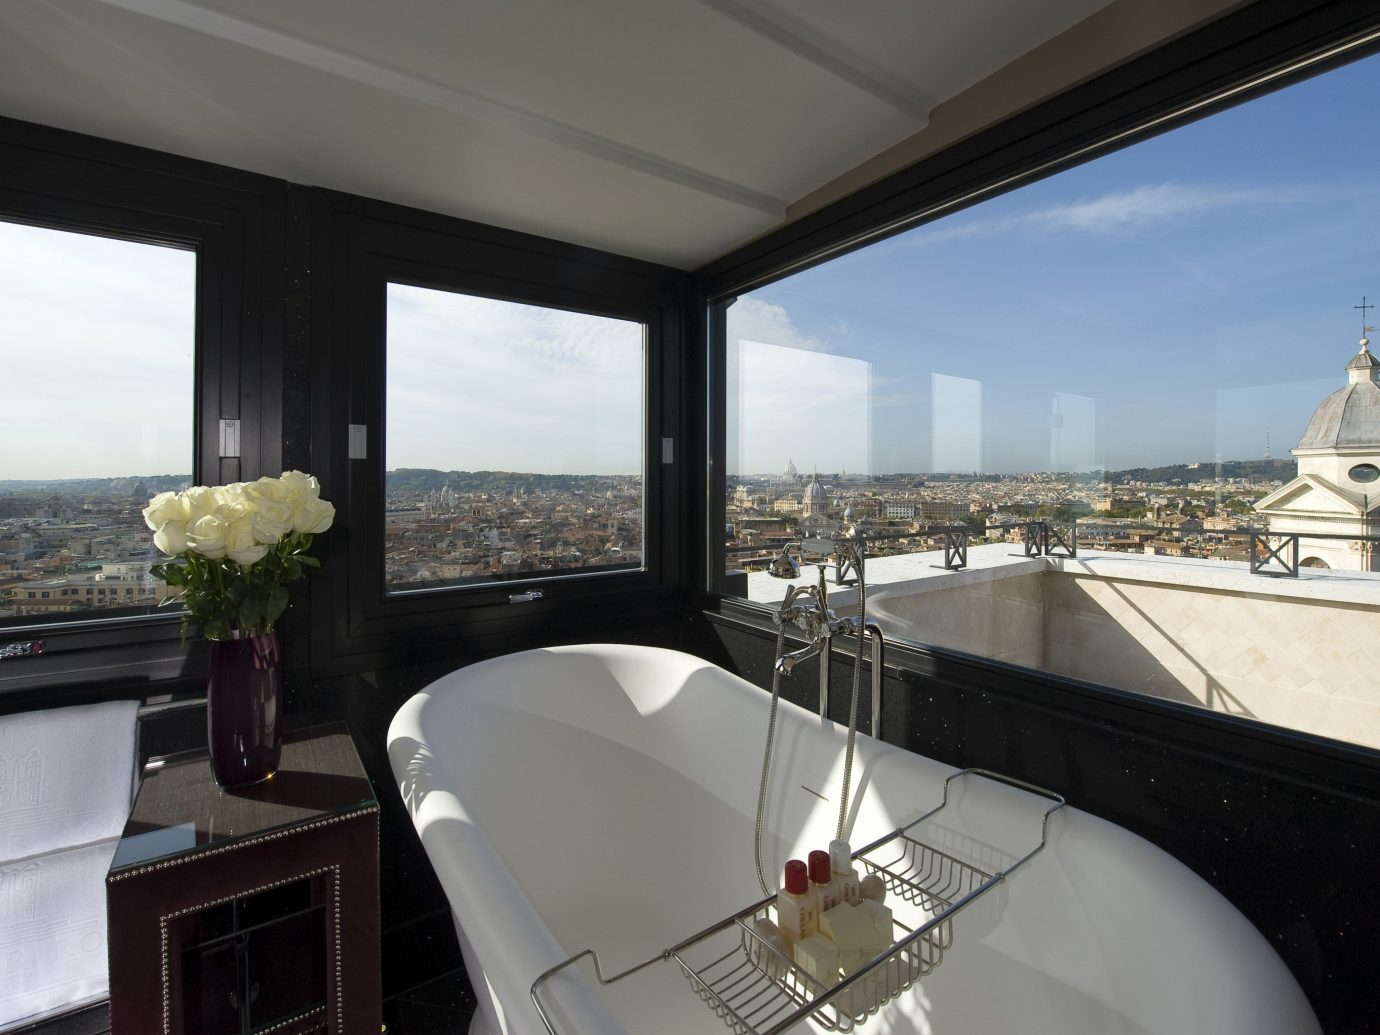 Hotels window Boat vehicle passenger ship luxury yacht yacht ship watercraft estate